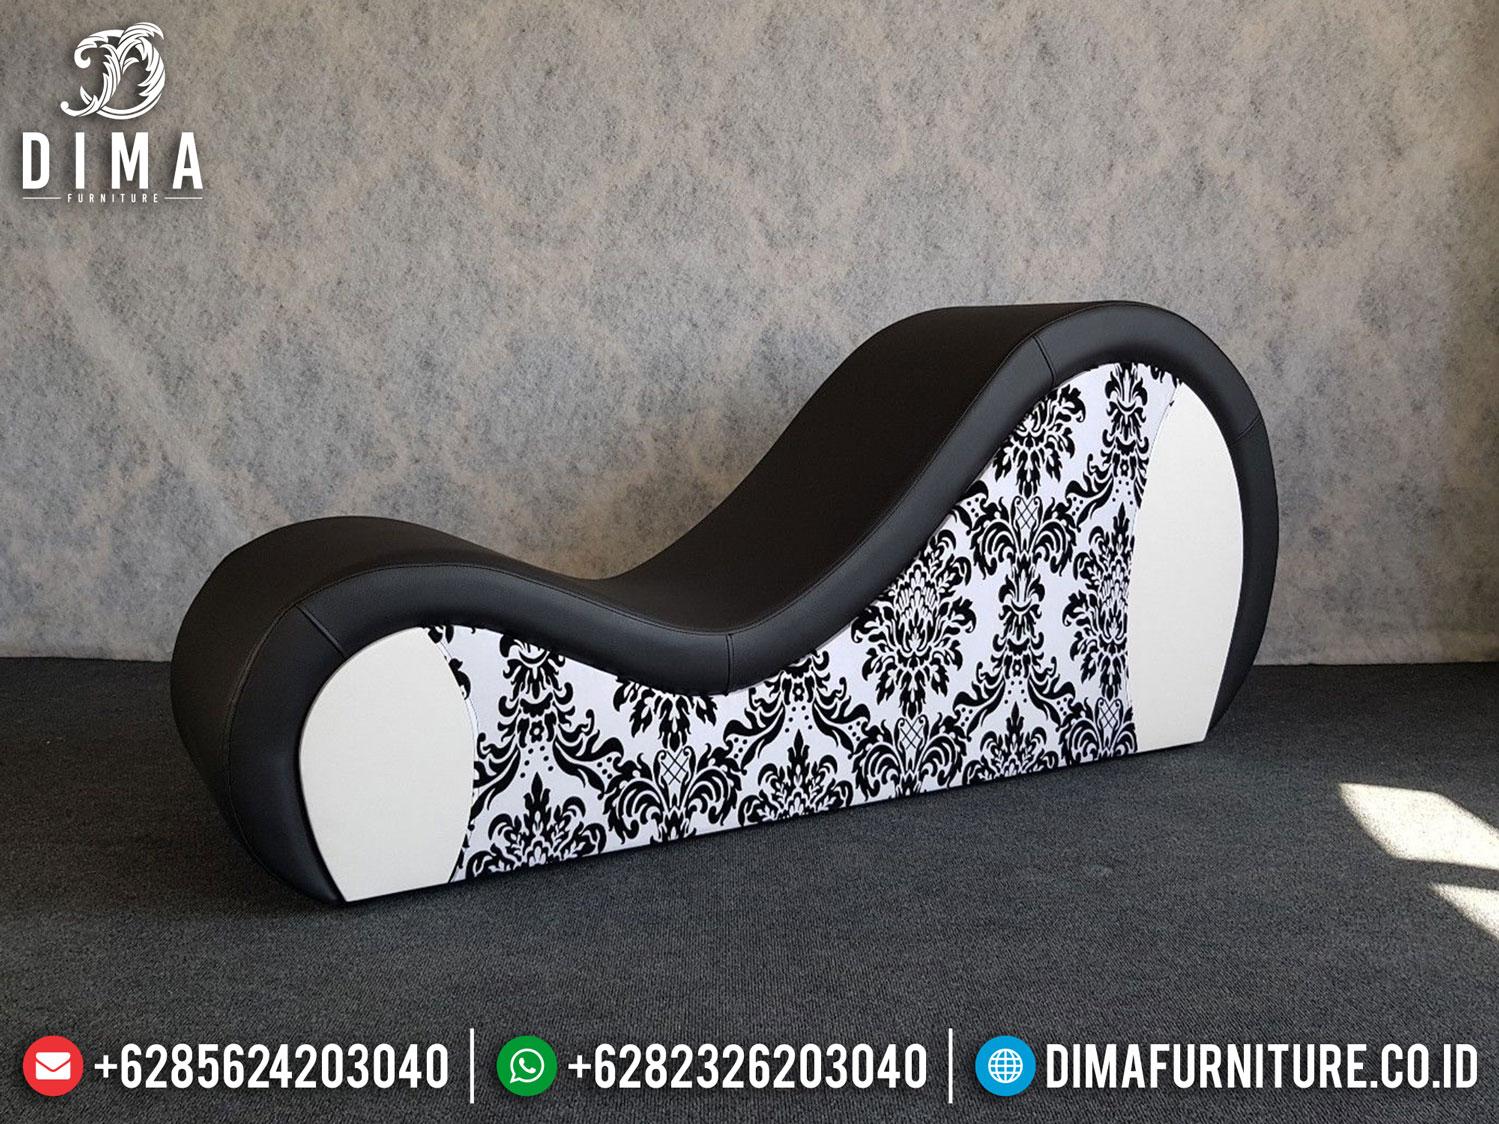 New Sofa Tantra, Sofa Cinta Luxury High Quality Product Jepara ST-1080